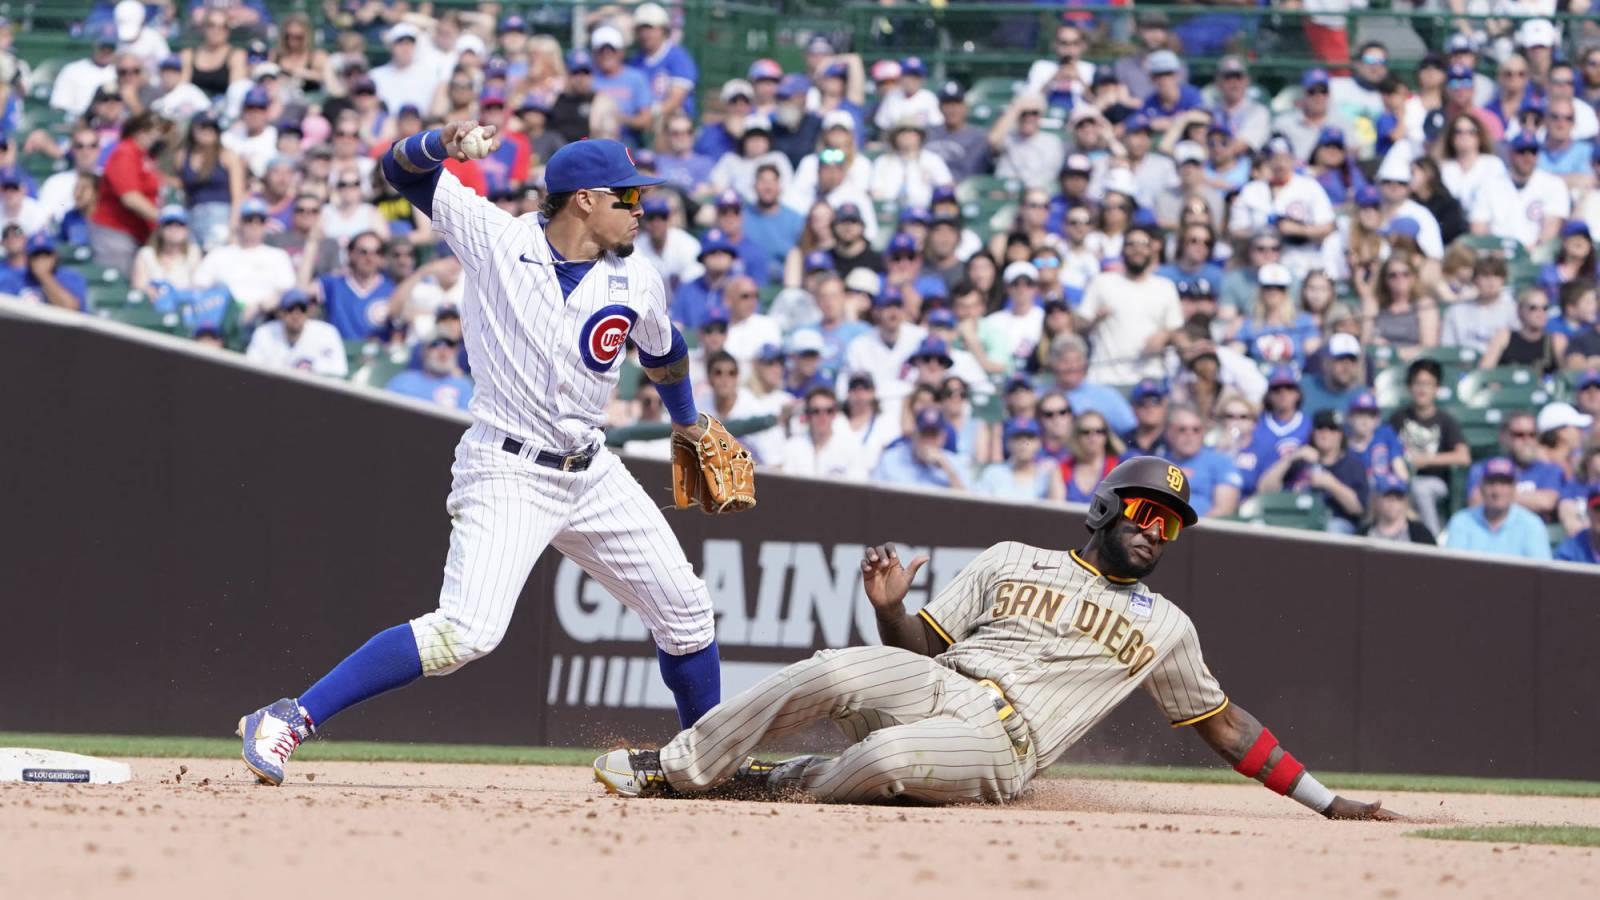 Fan runs on field during Padres-Cubs game | Yardbarker